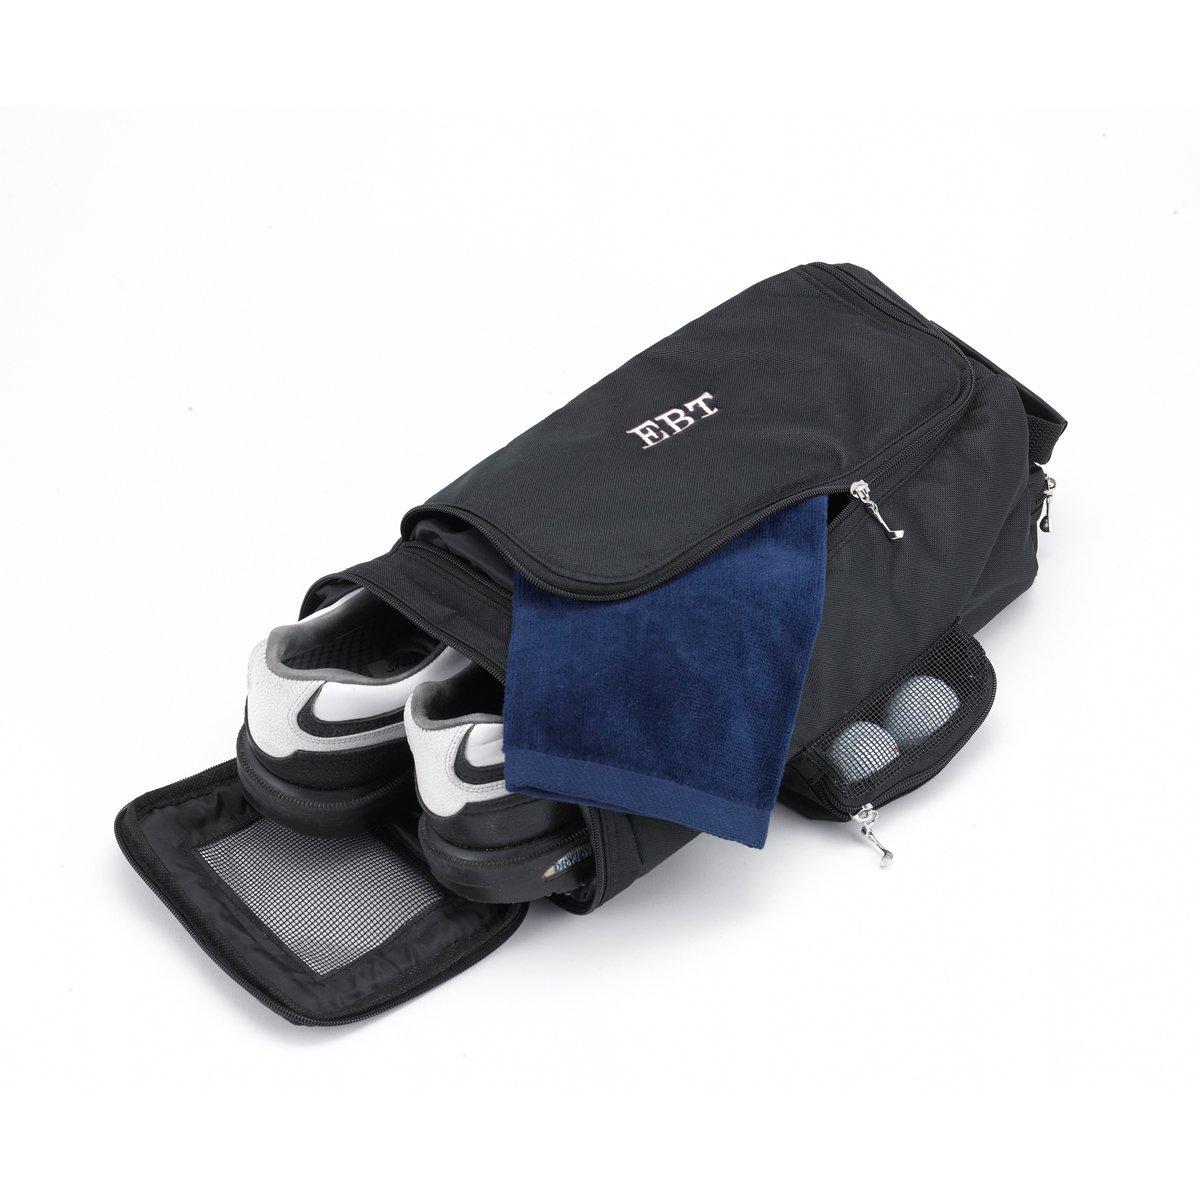 Personalized Golf Shoe Bag - Monogrammed Shoe Bag - Golf Shoe Bag by A Gift Personalized